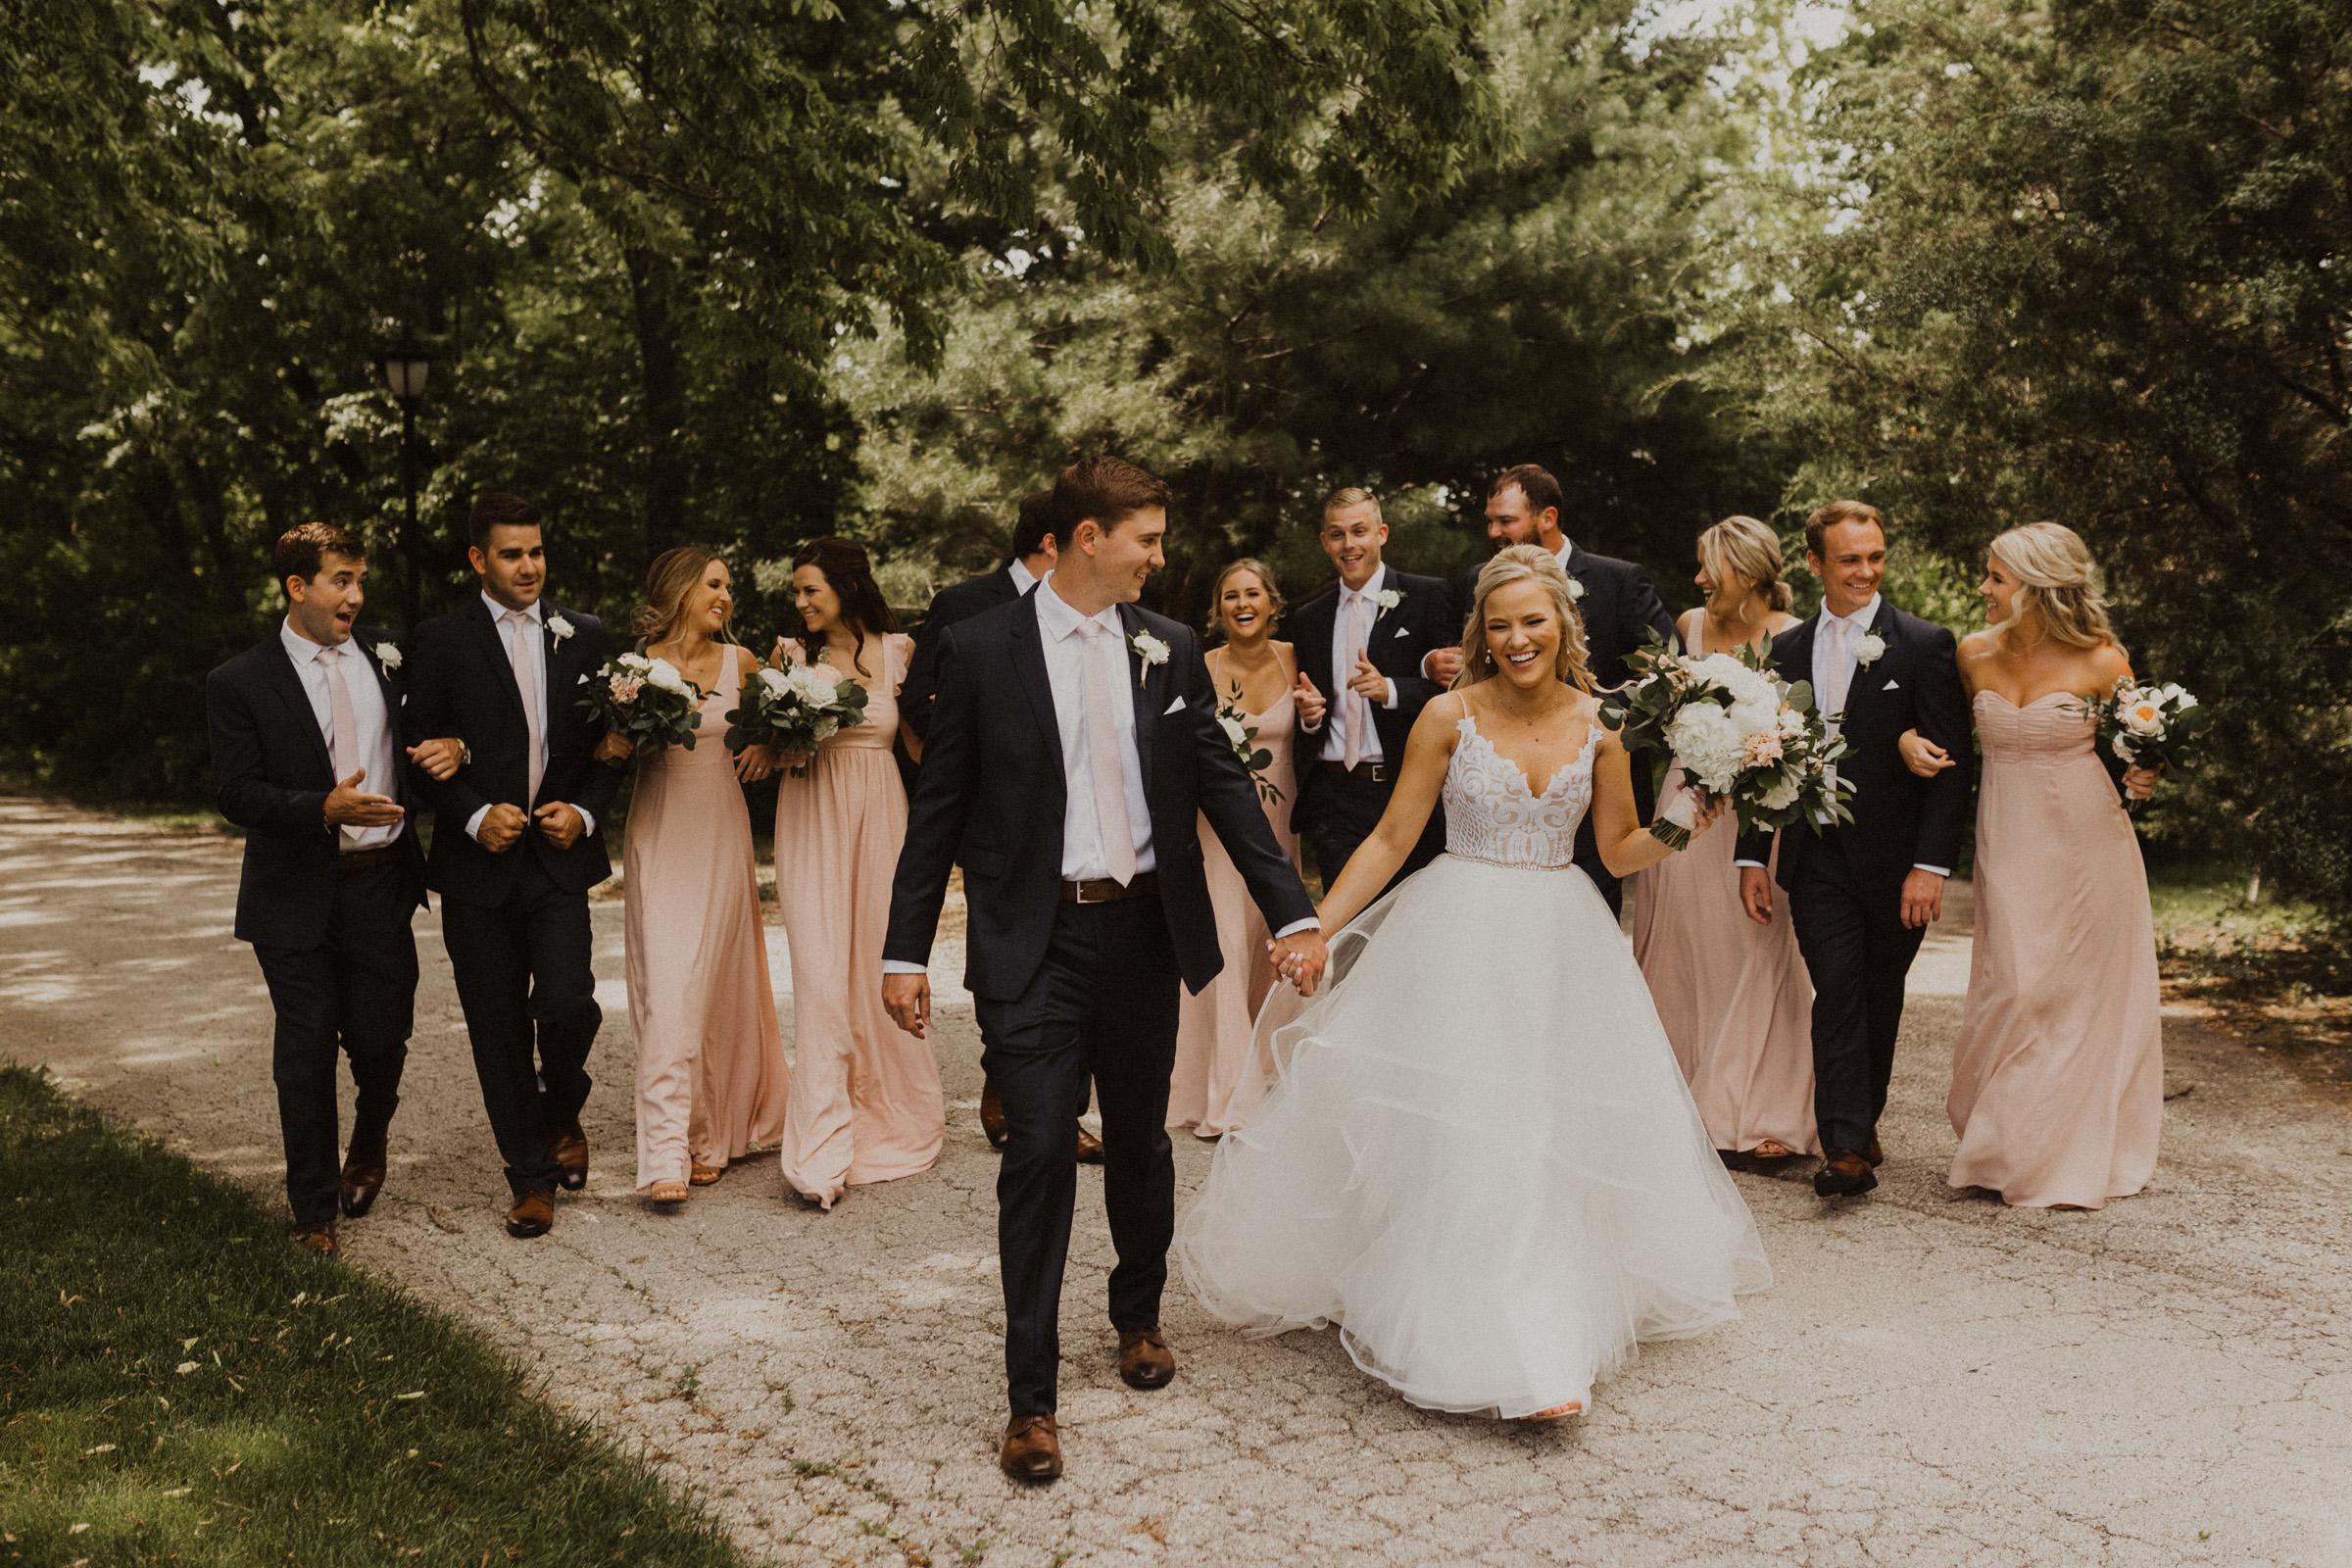 alyssa barletter photography hawthorne house summer outdoor wedding southern charm inspiration-29.jpg